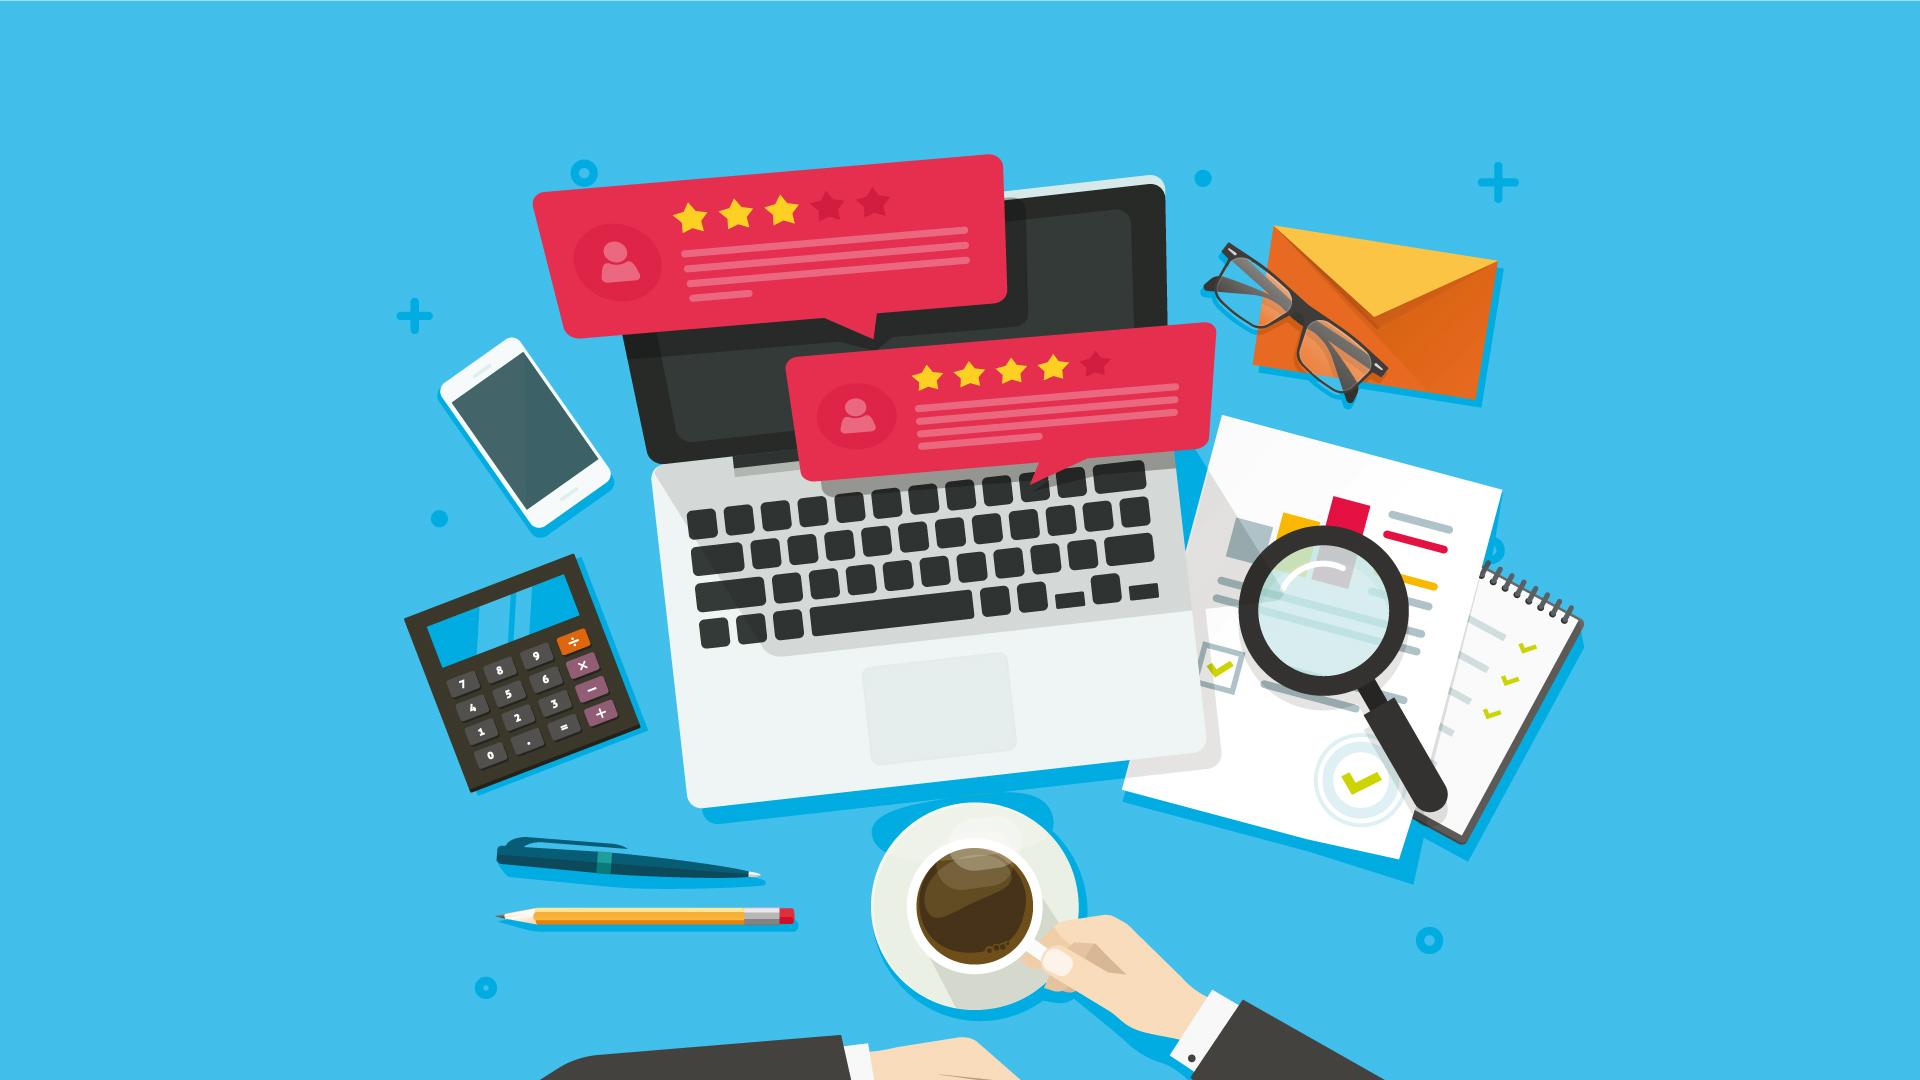 reputazione aziendale online